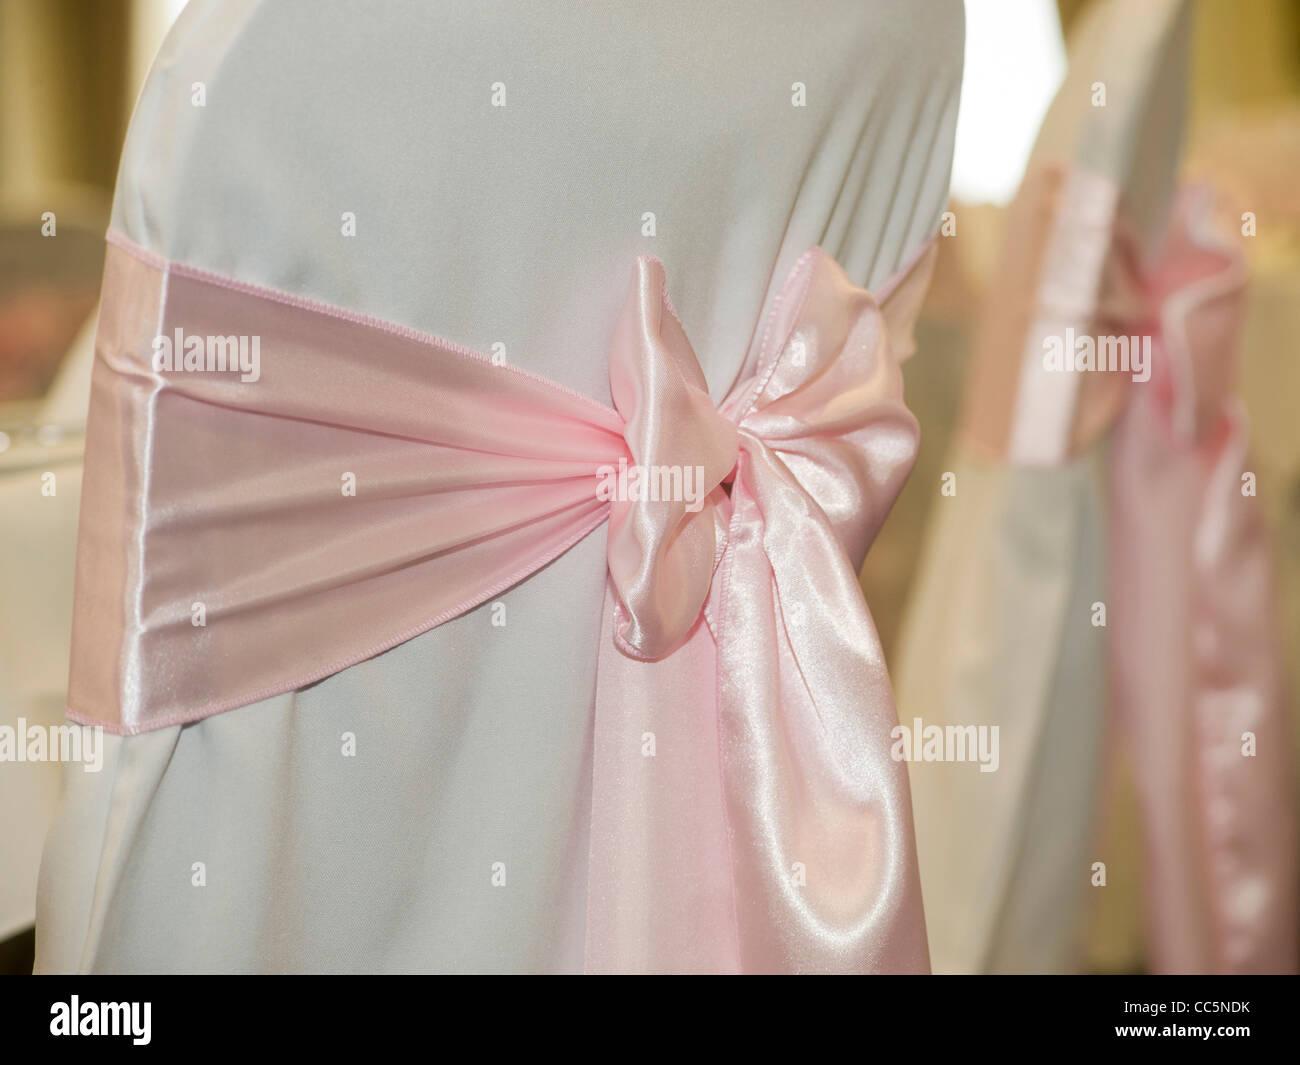 Sedia Pantone Rosa : Rosa stuhl stockfotos & rosa stuhl bilder alamy